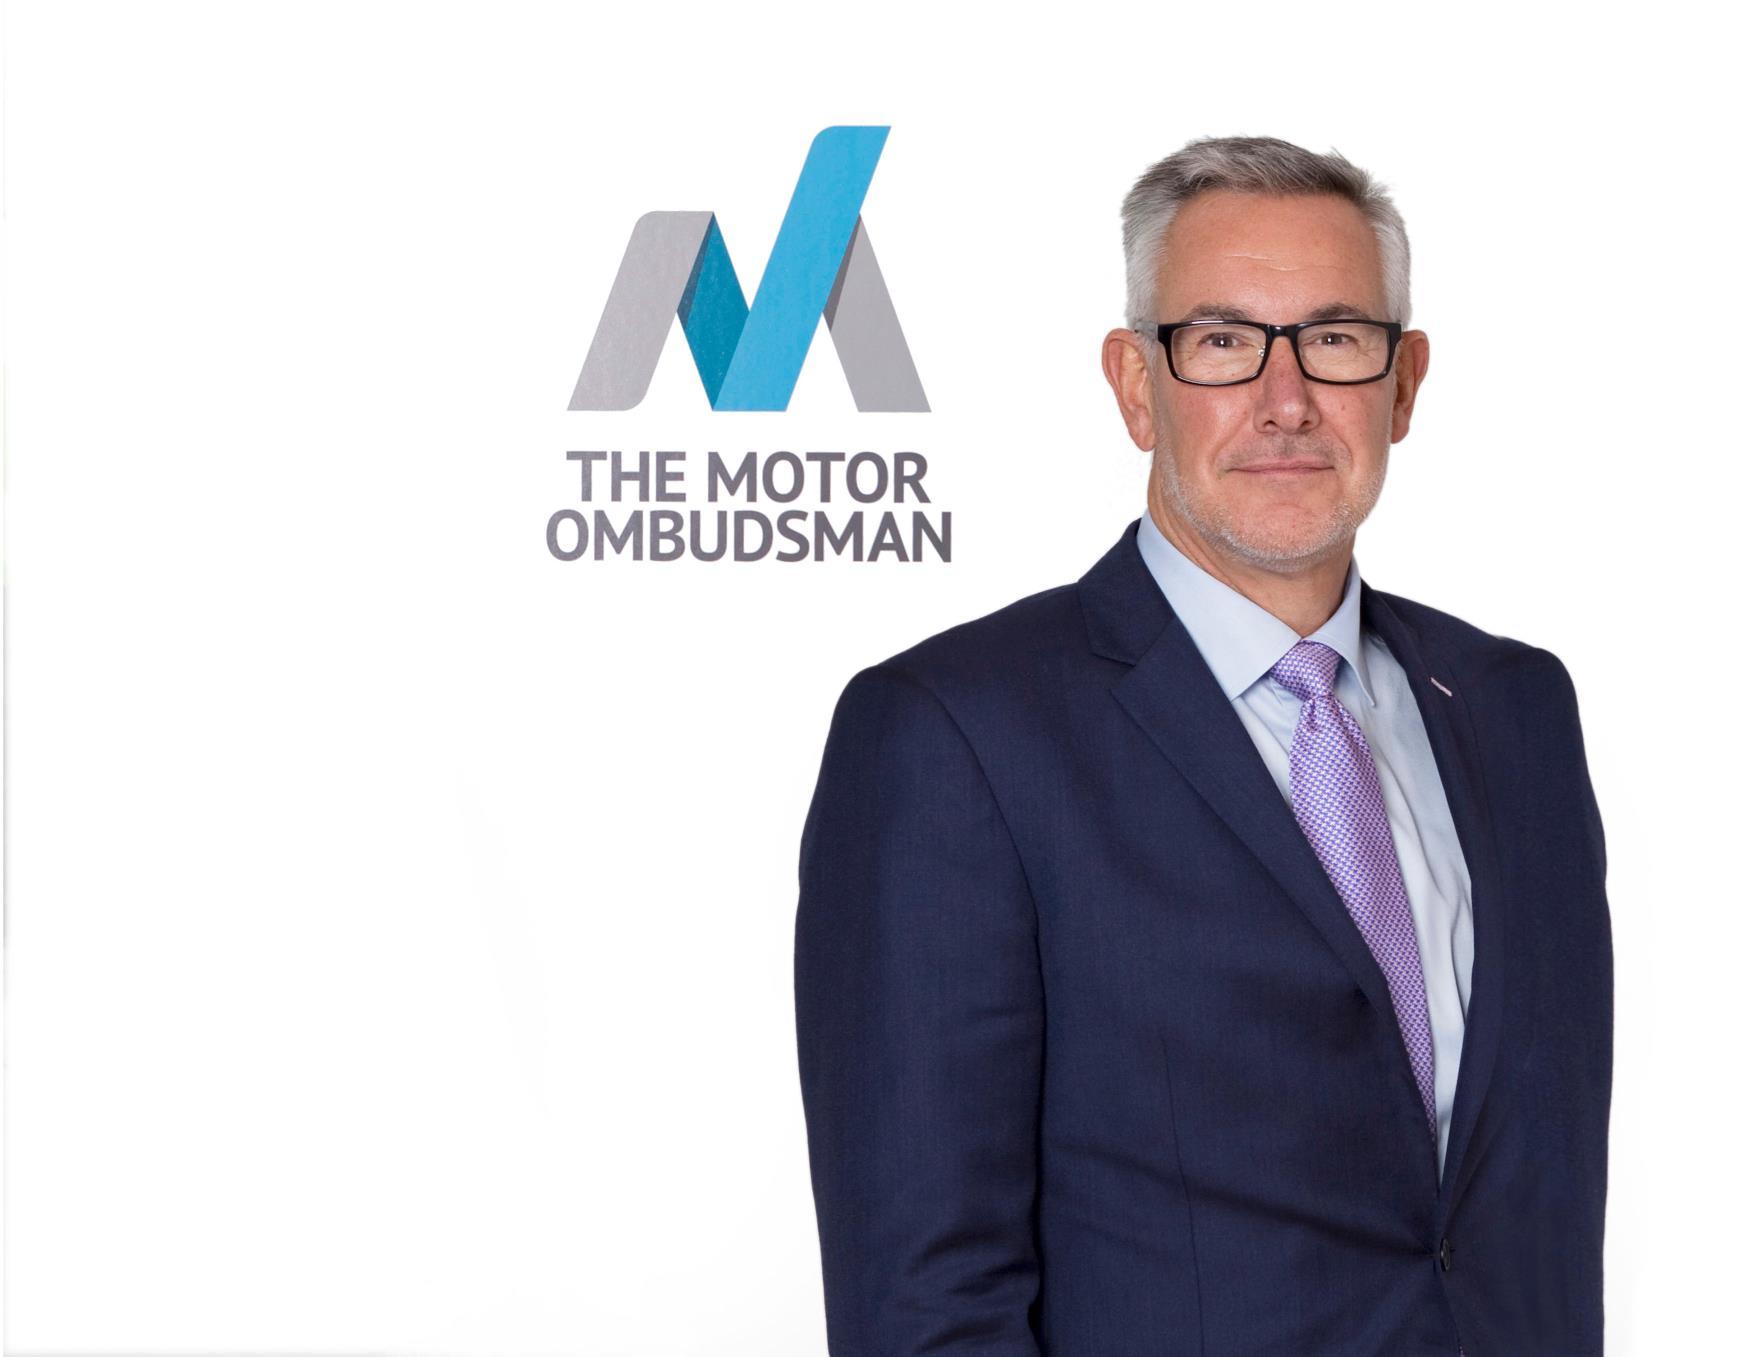 Bill Fennell, Managing Director of The Motor Ombudsman